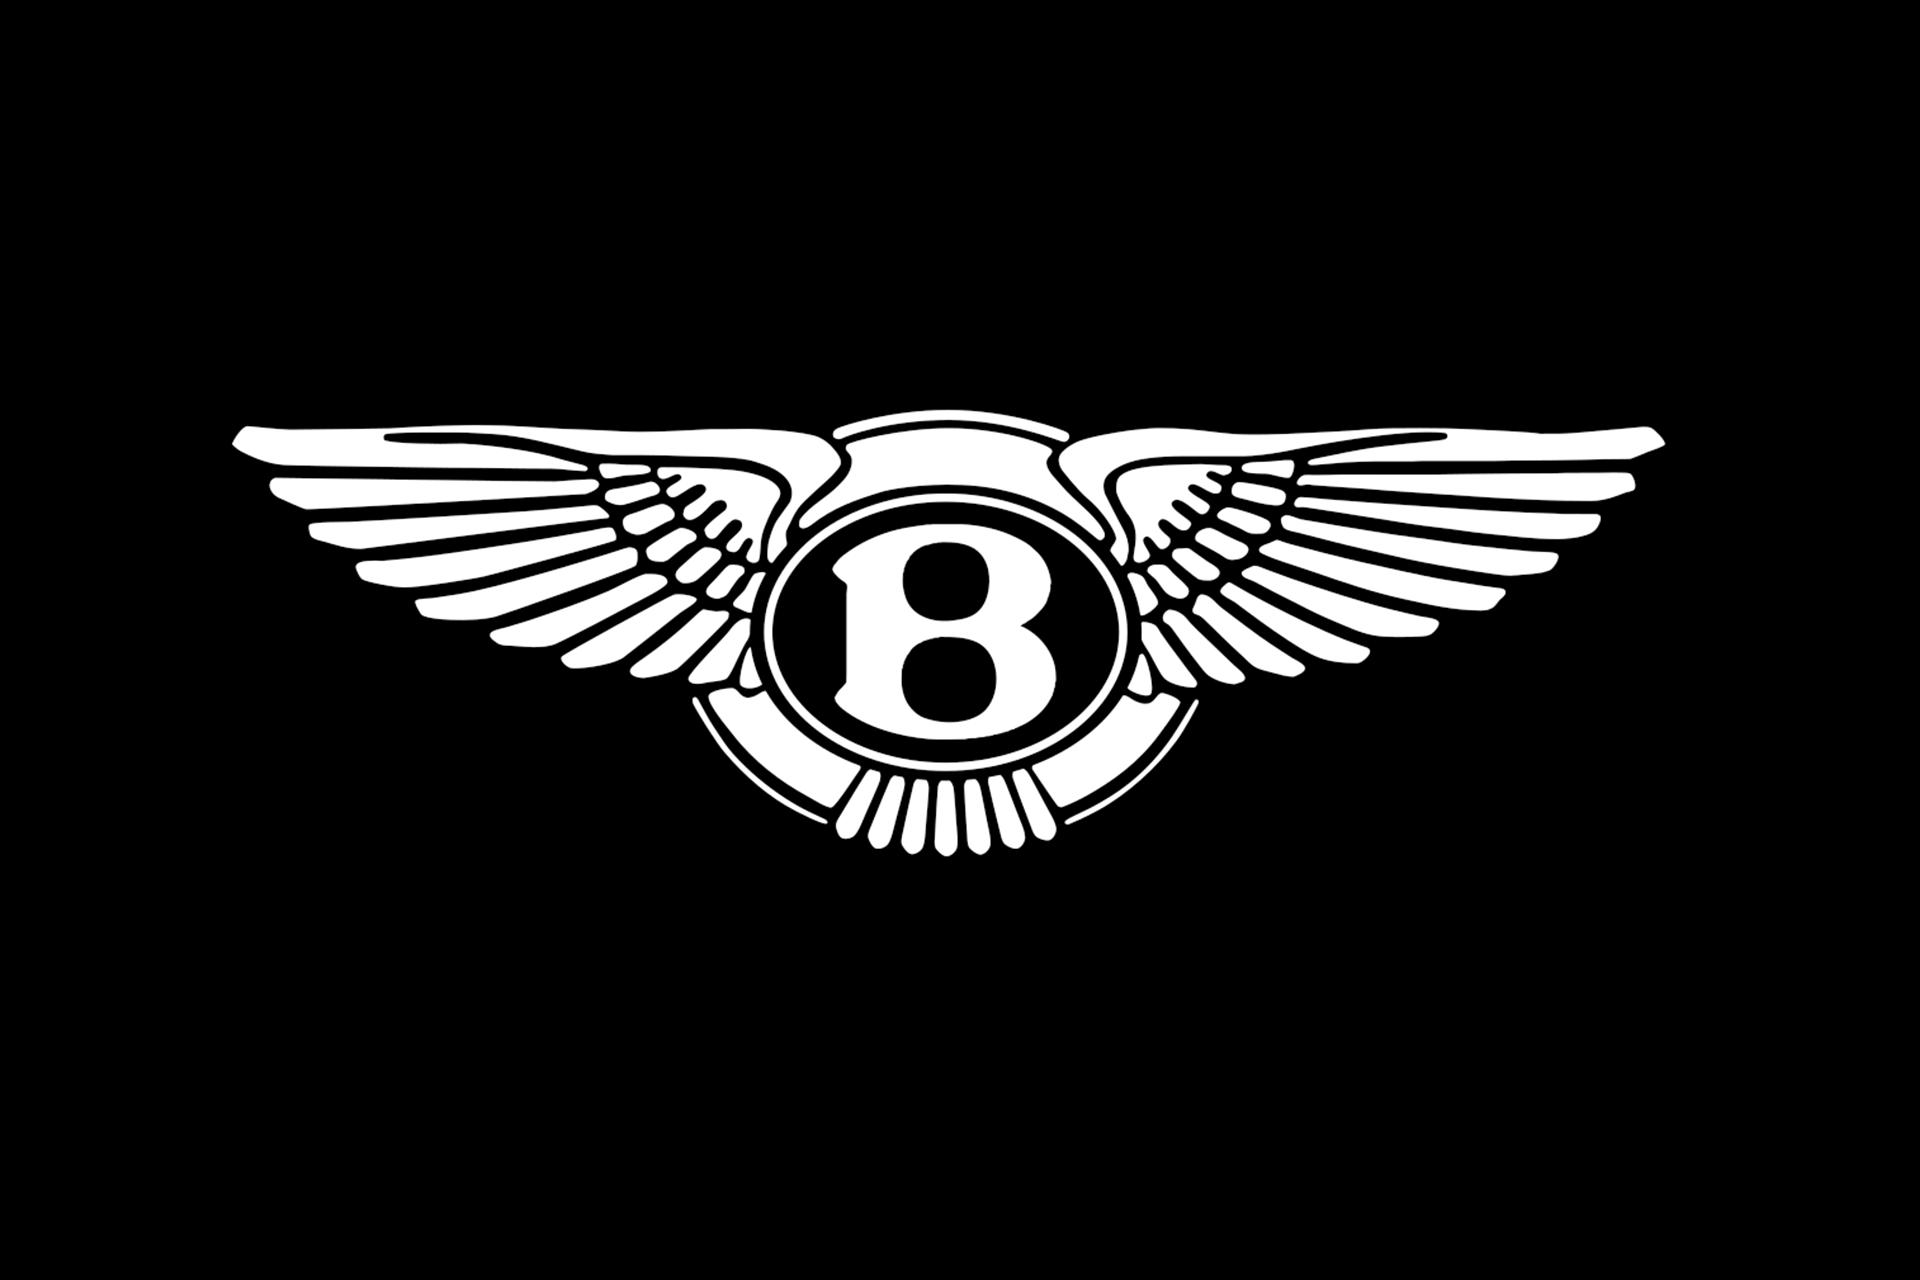 bentley referenz jentner metallveredelung logo farbig